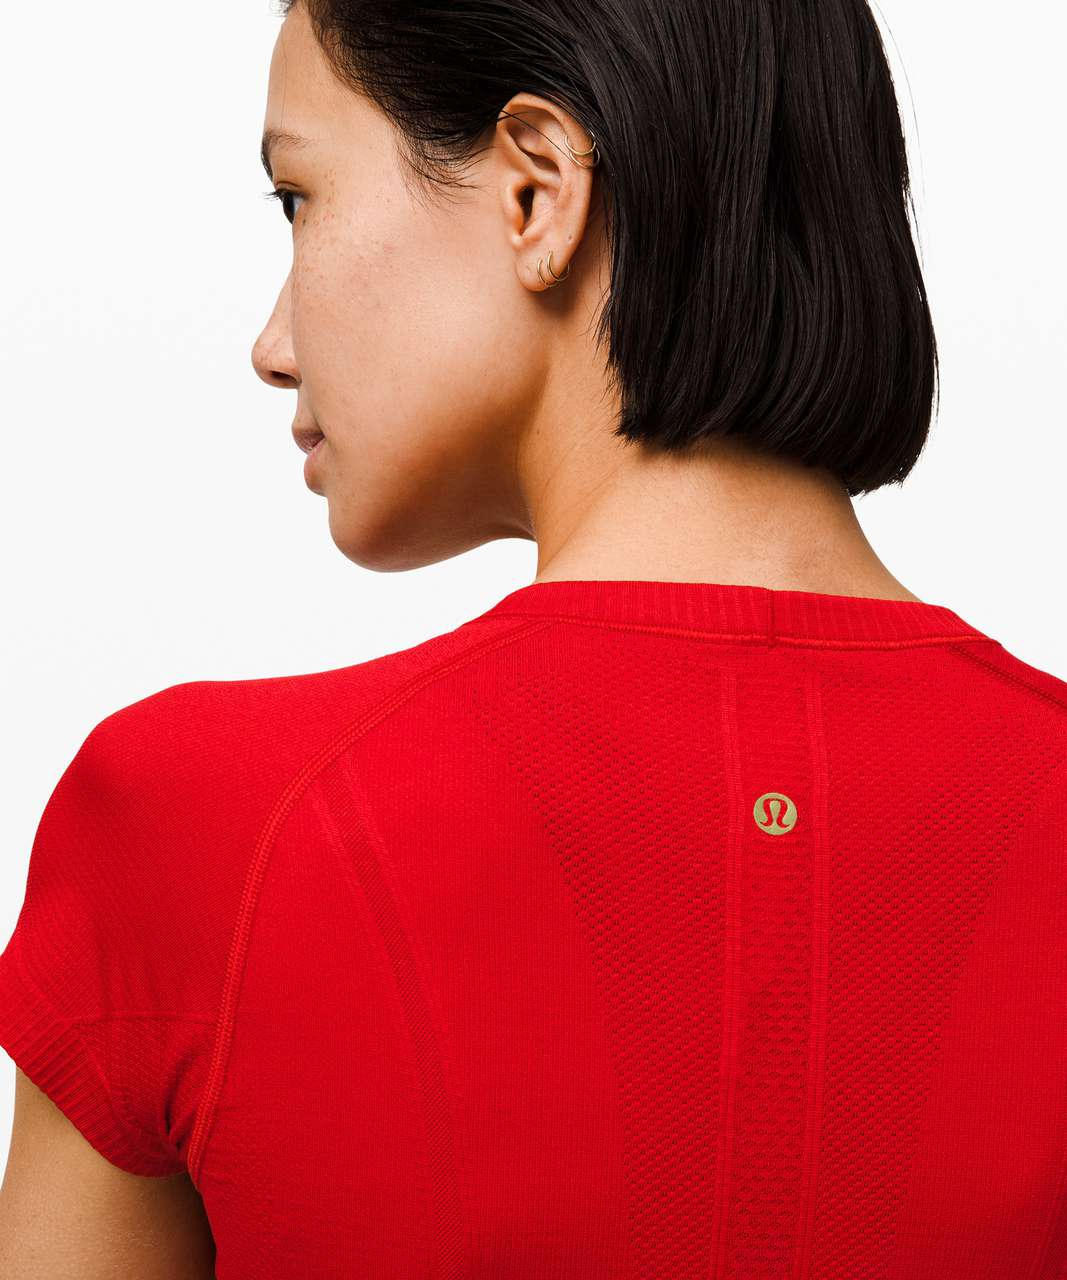 Lululemon Swiftly Tech Short Sleeve Crew *Lunar New Year - Dark Red / Dark Red